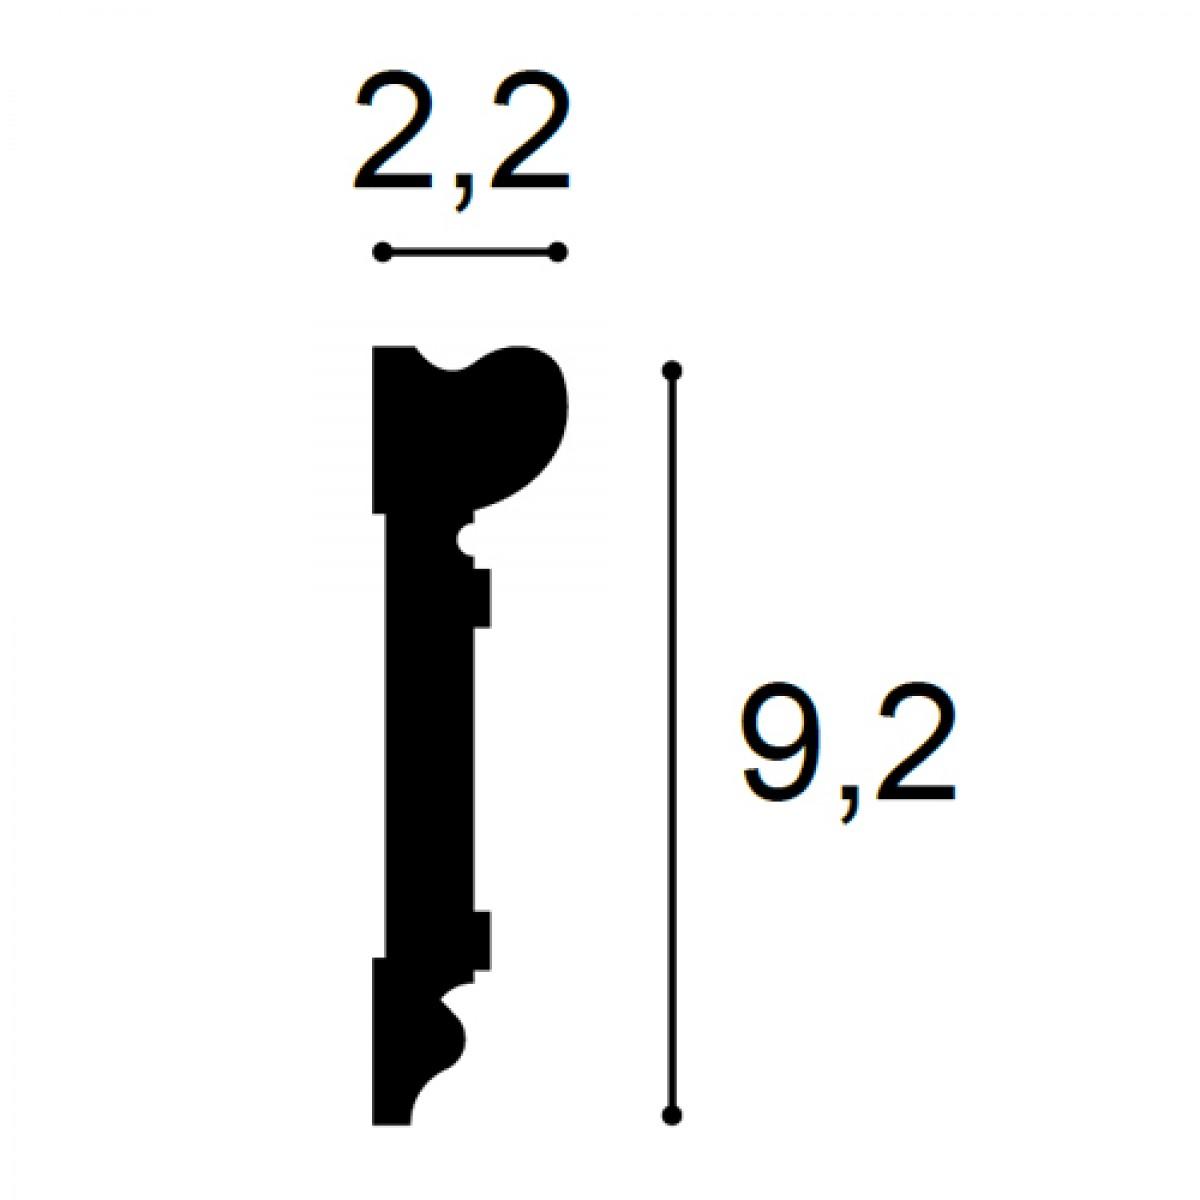 Ancadrament Usa Luxxus DX119-2300, Dimensiuni: 230 X 9.2 X 2.2 cm, Orac Decor